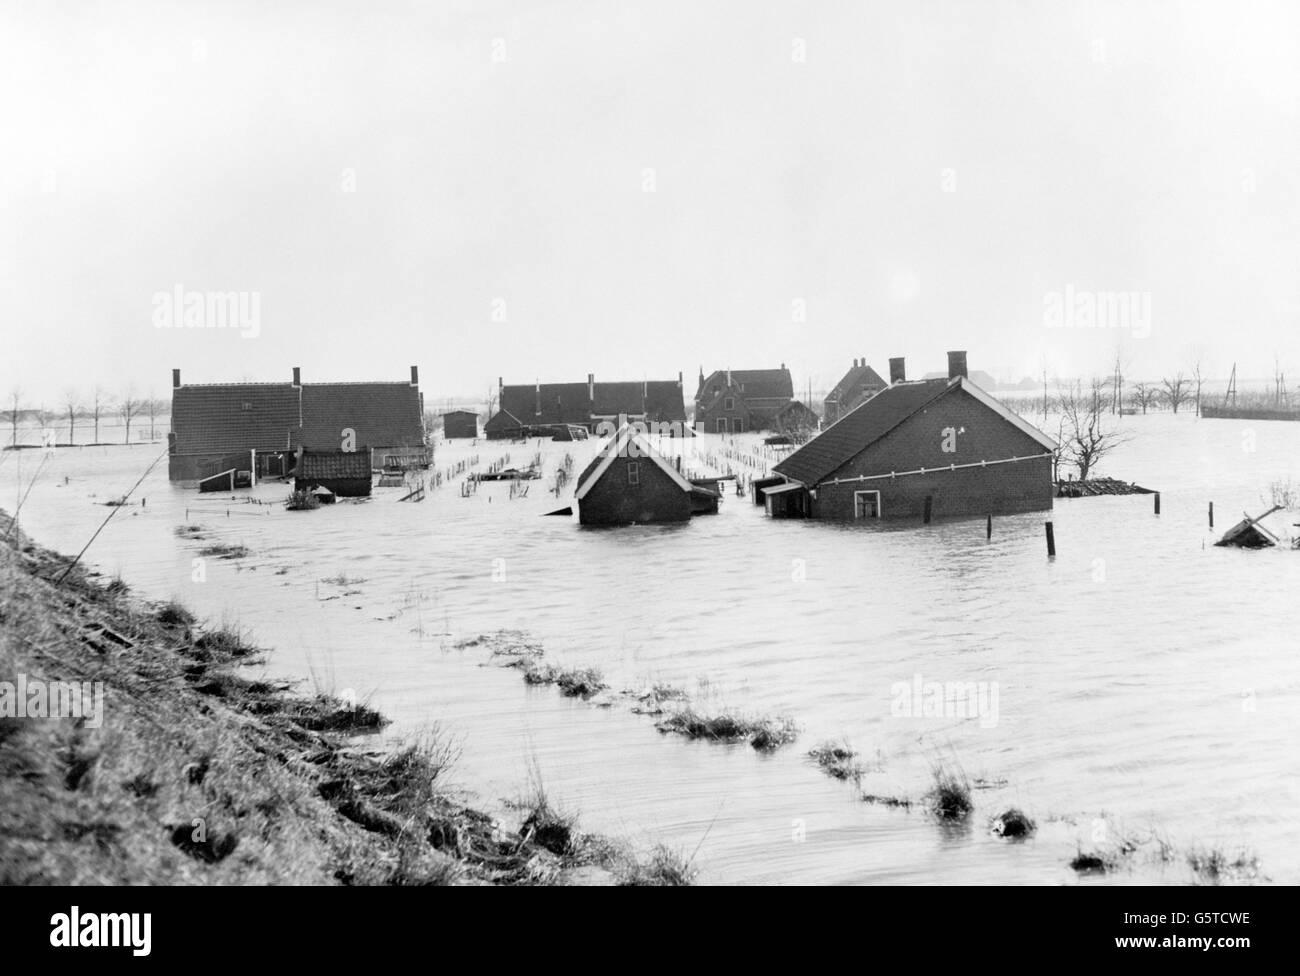 Environment - Flooding - Rilland-Bath - Zealand - Holland - Stock Image